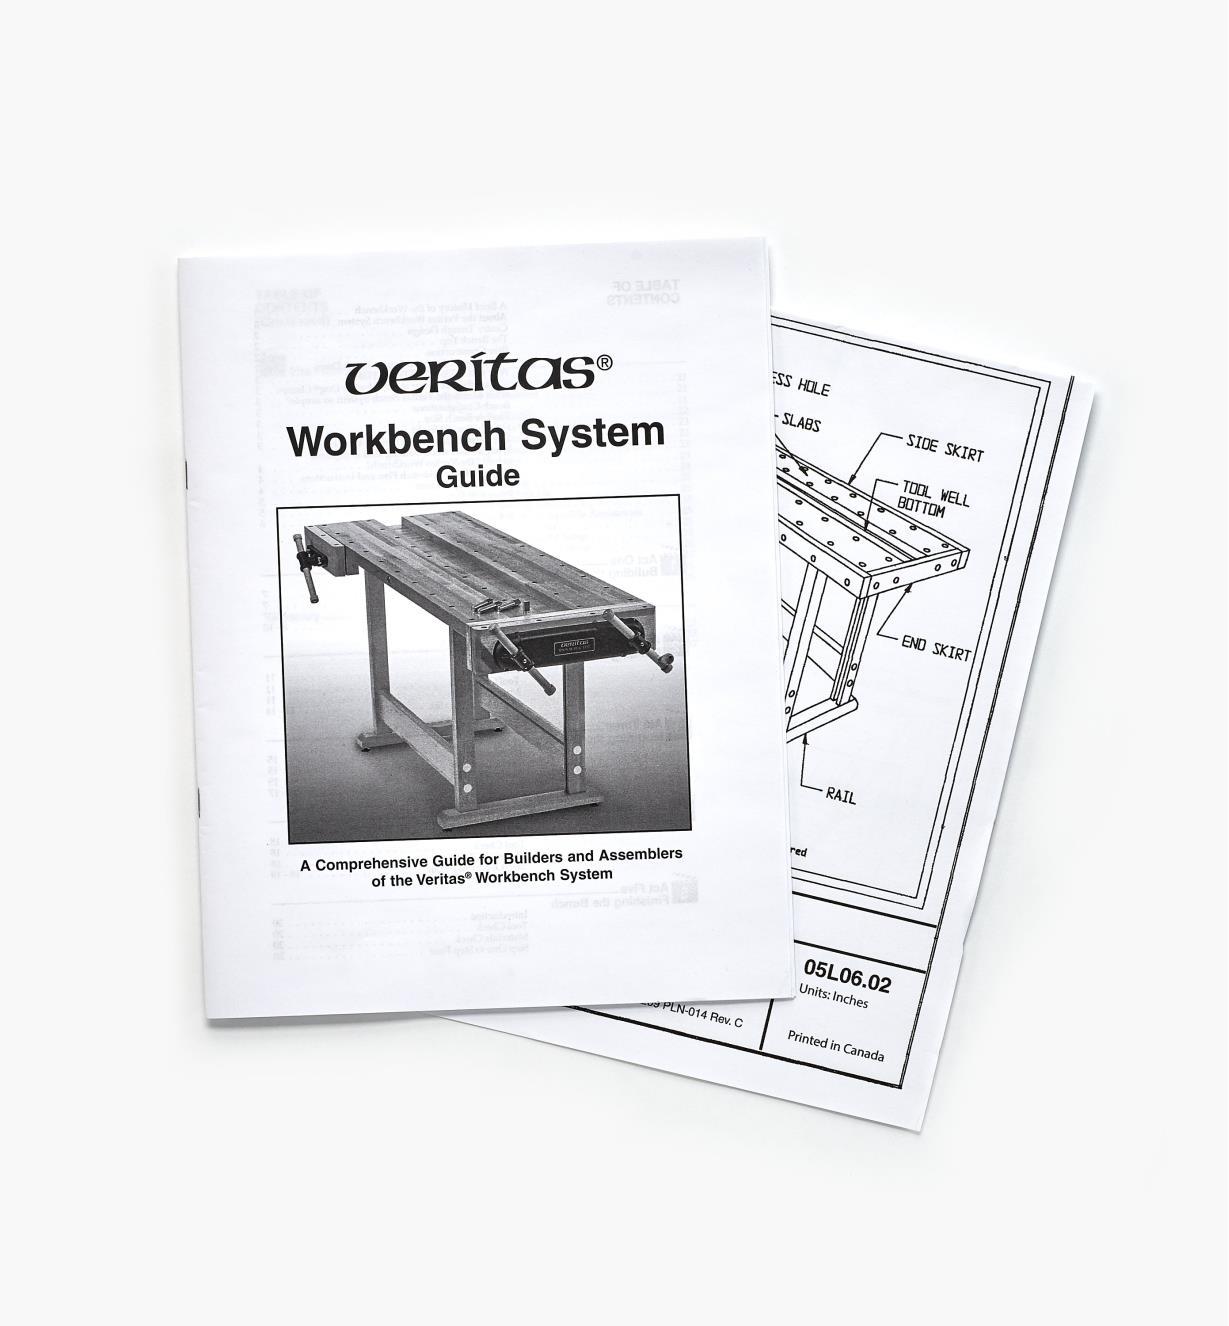 05L0602 - Veritas Workbench Plan